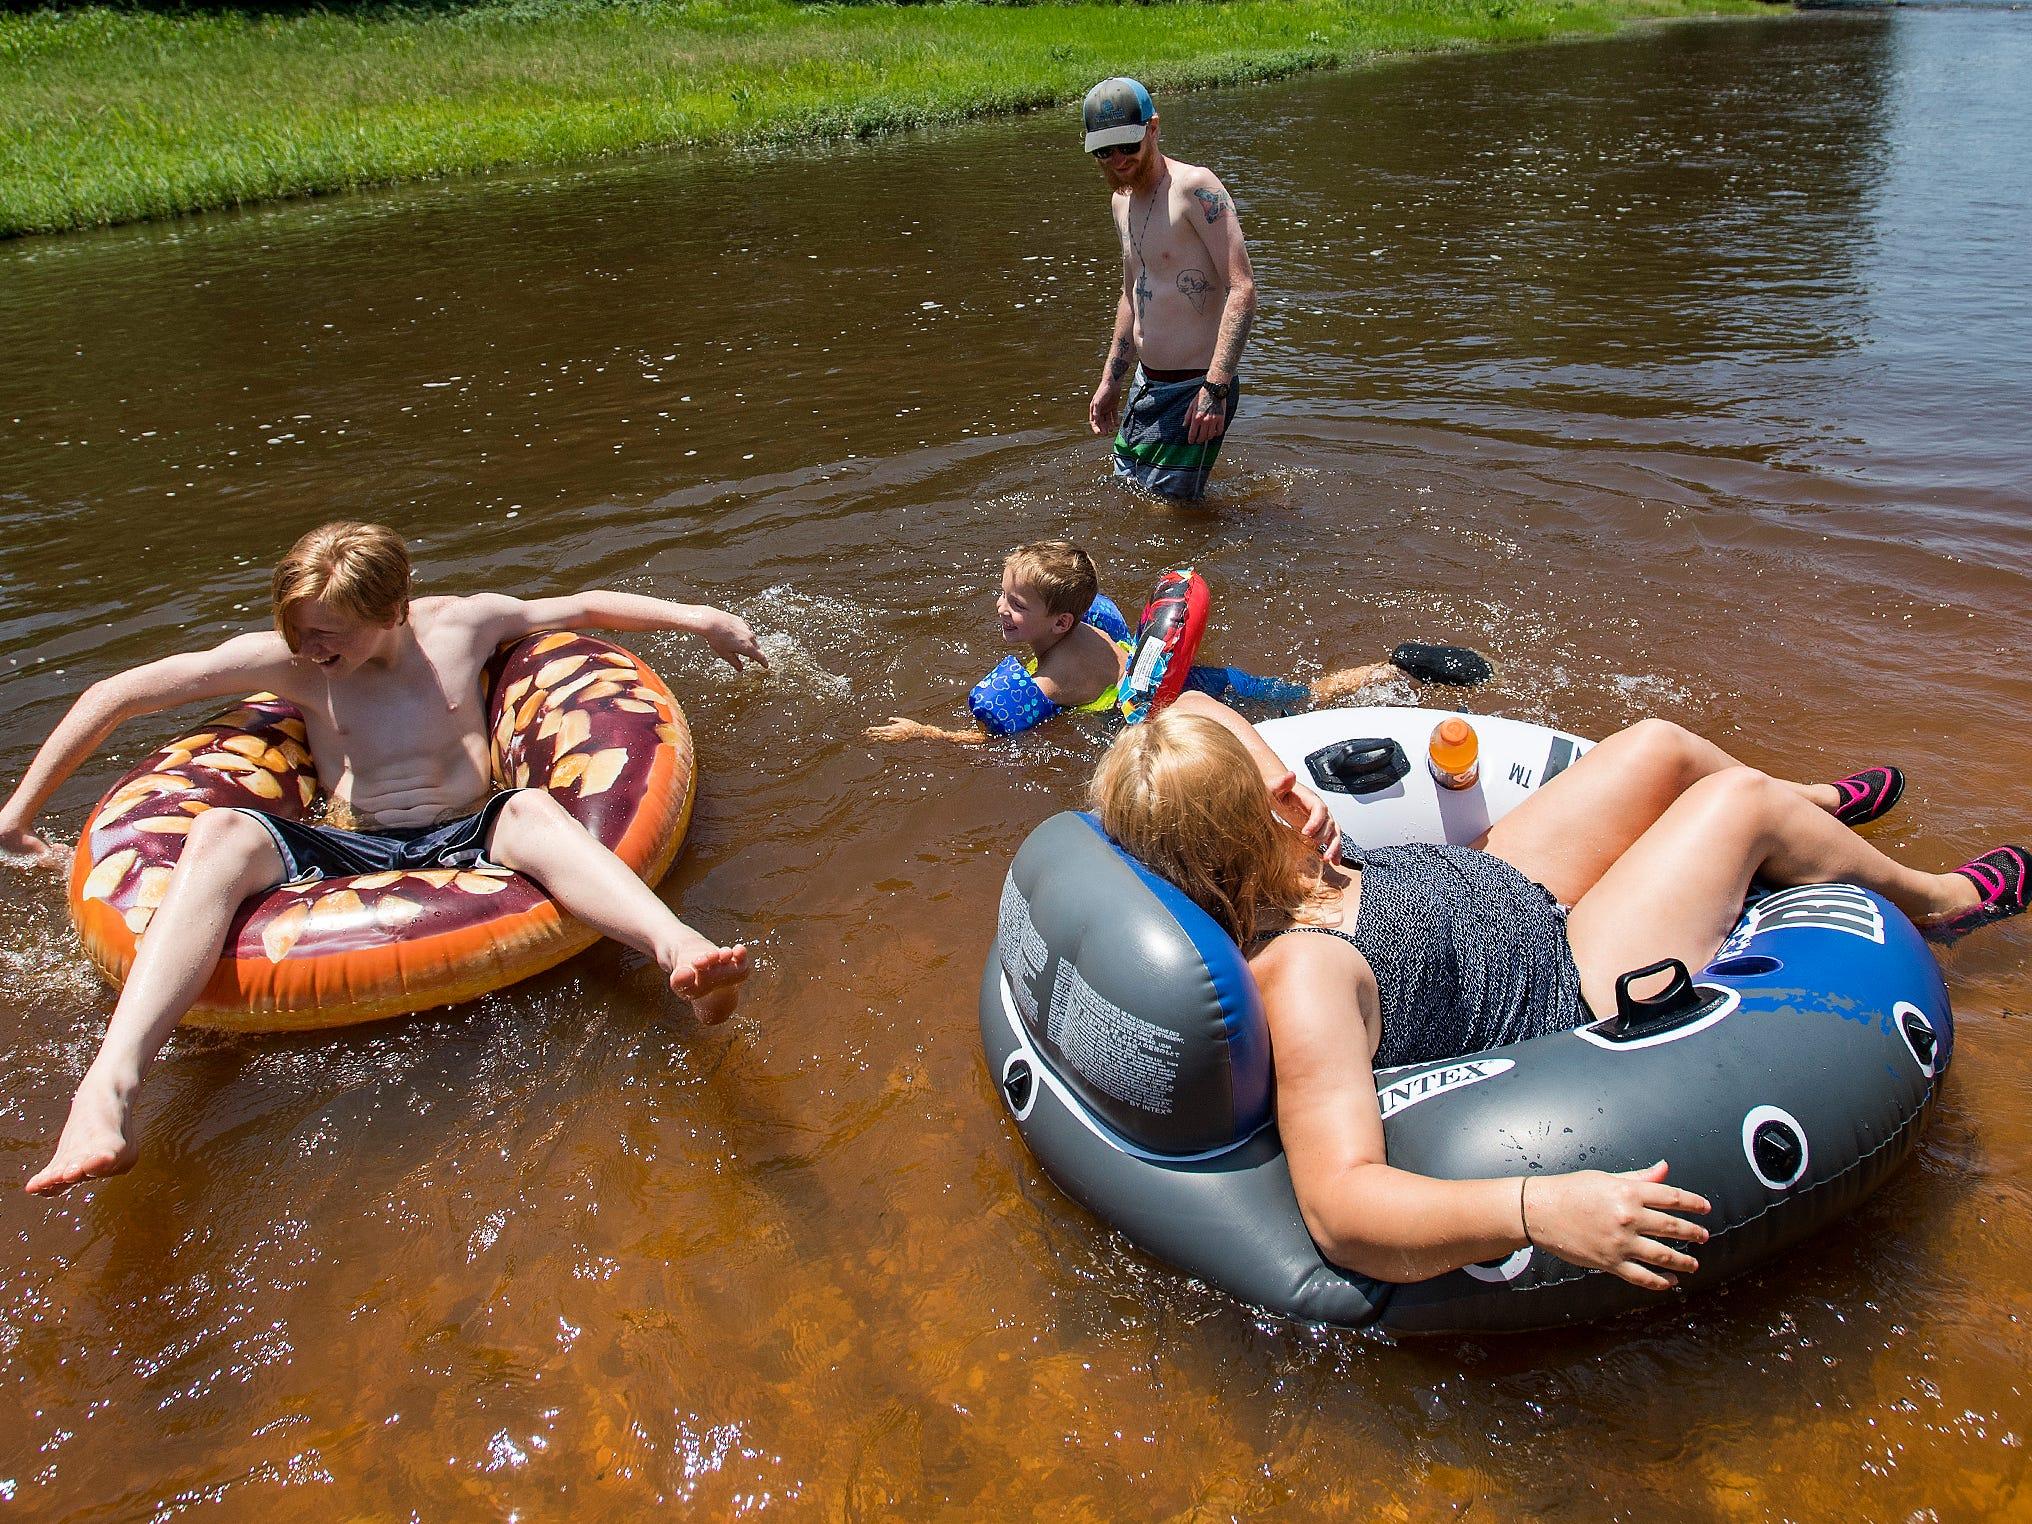 Caleb Eady, from left, Sawyer Sims, Chris Thomas and Karson Smith float on  Autauga Creek in Prattville, Ala., on Saturday, July 21, 2018.